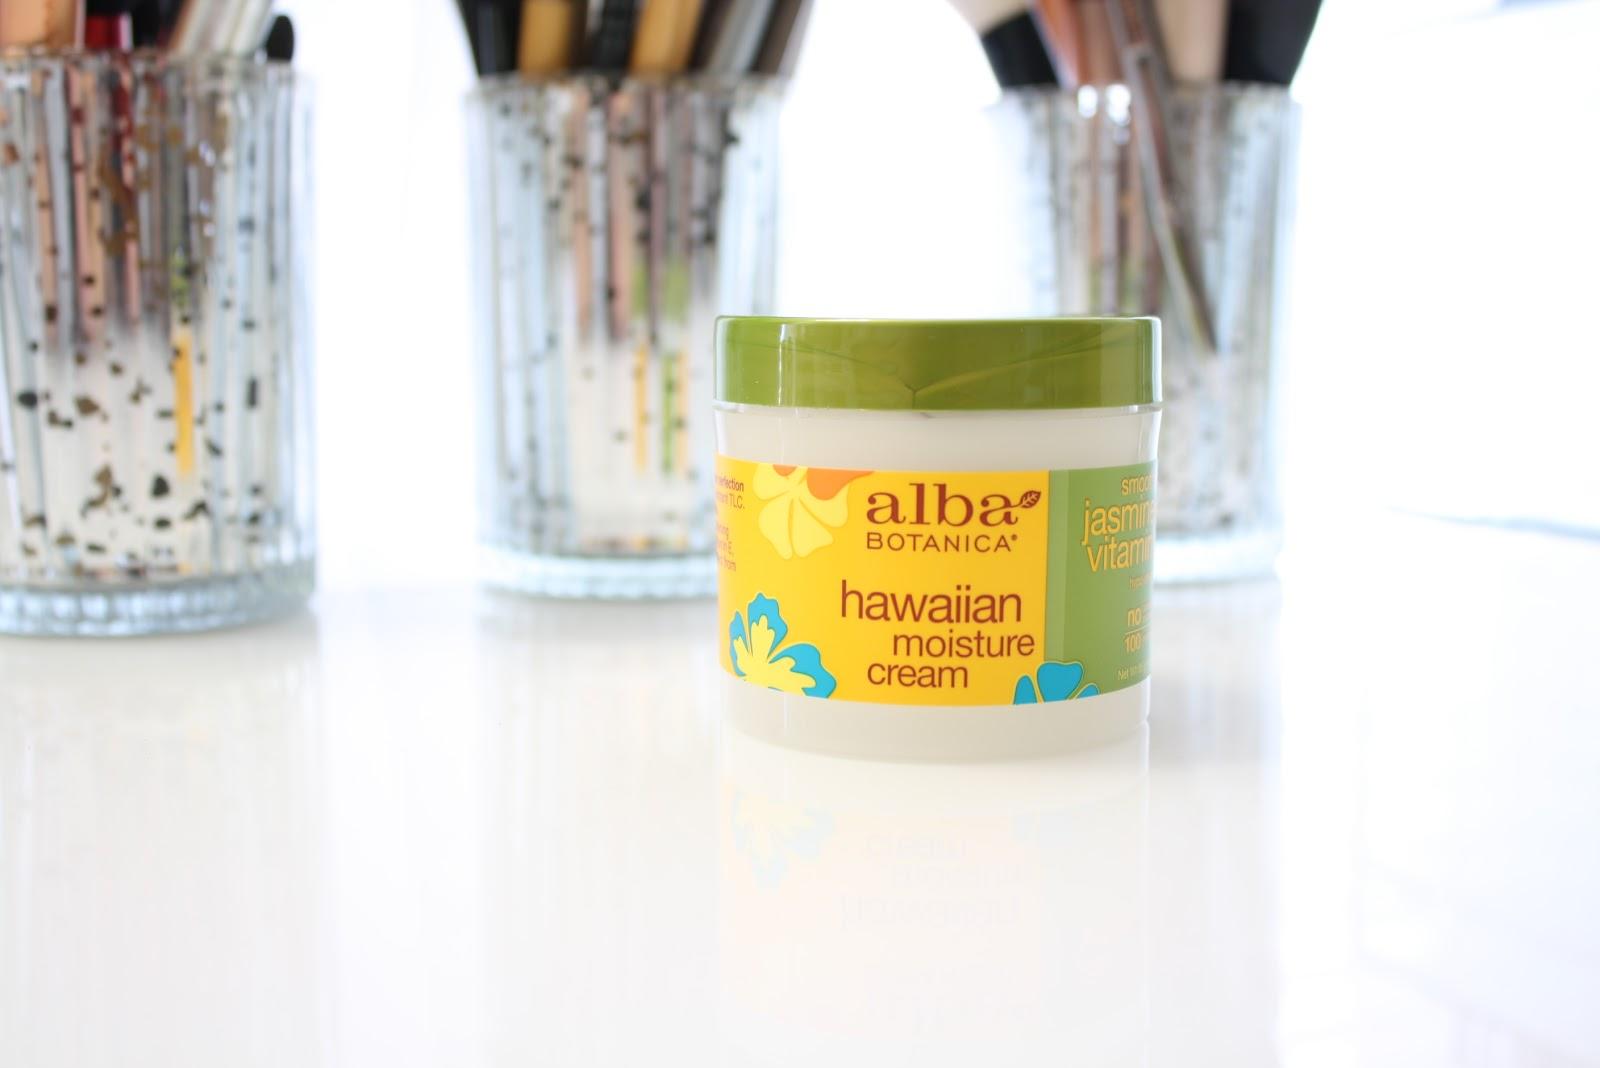 Alba Botanica Hawaiian Jasmine & Vitamin E Moisture Cream Review